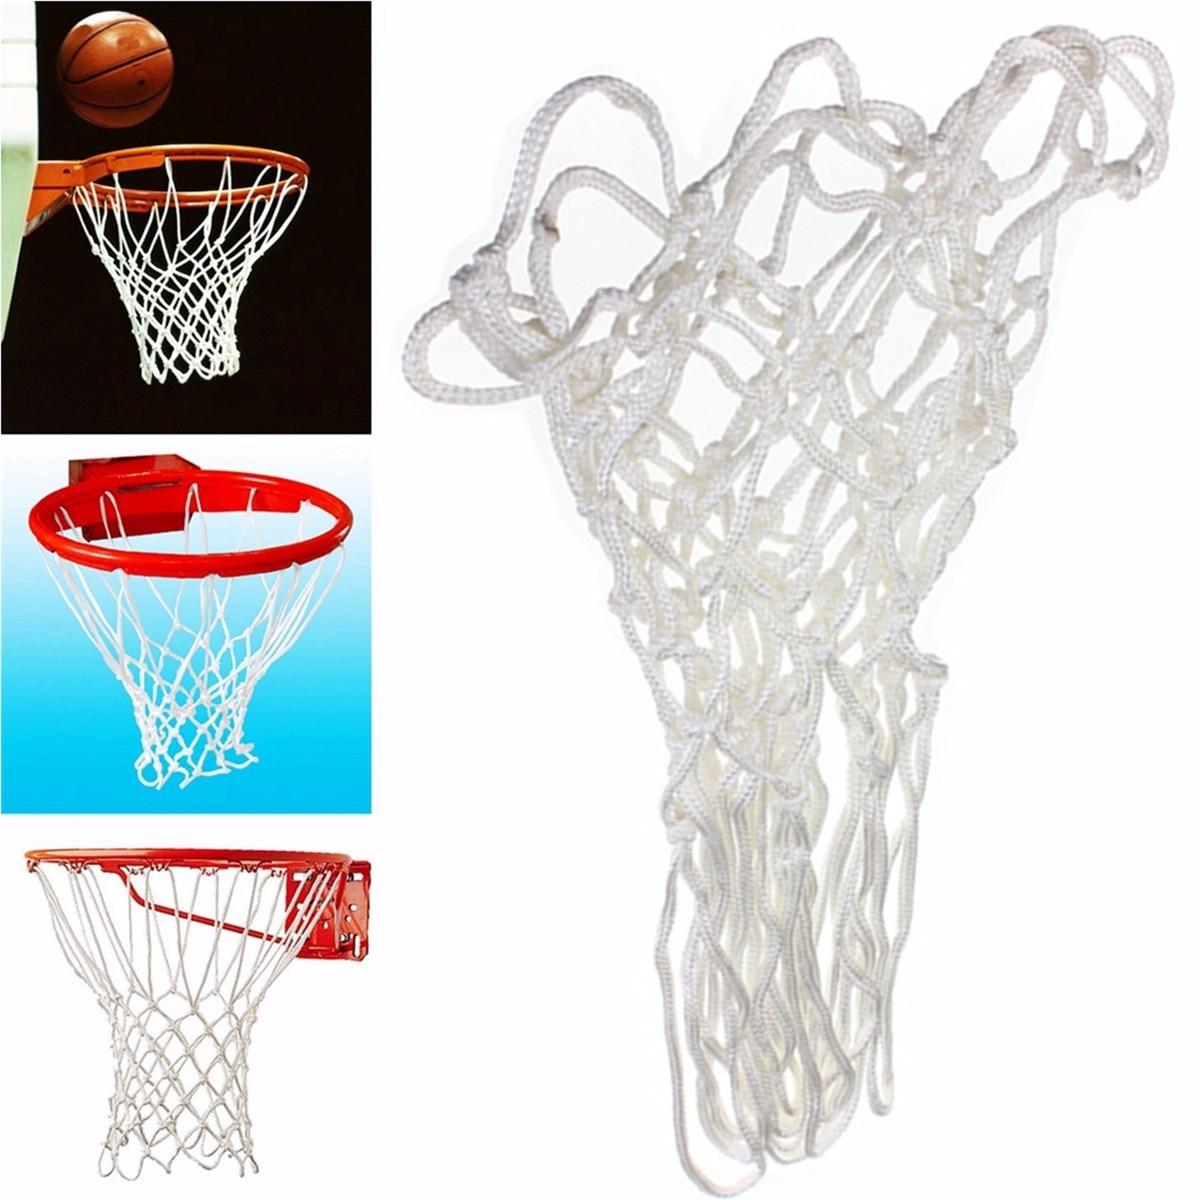 White Durable Nylon 4mm 12 Loops Basketball Net Durable Rugged Standard Nylon Thread Sports Basketball Hoop Mesh Net